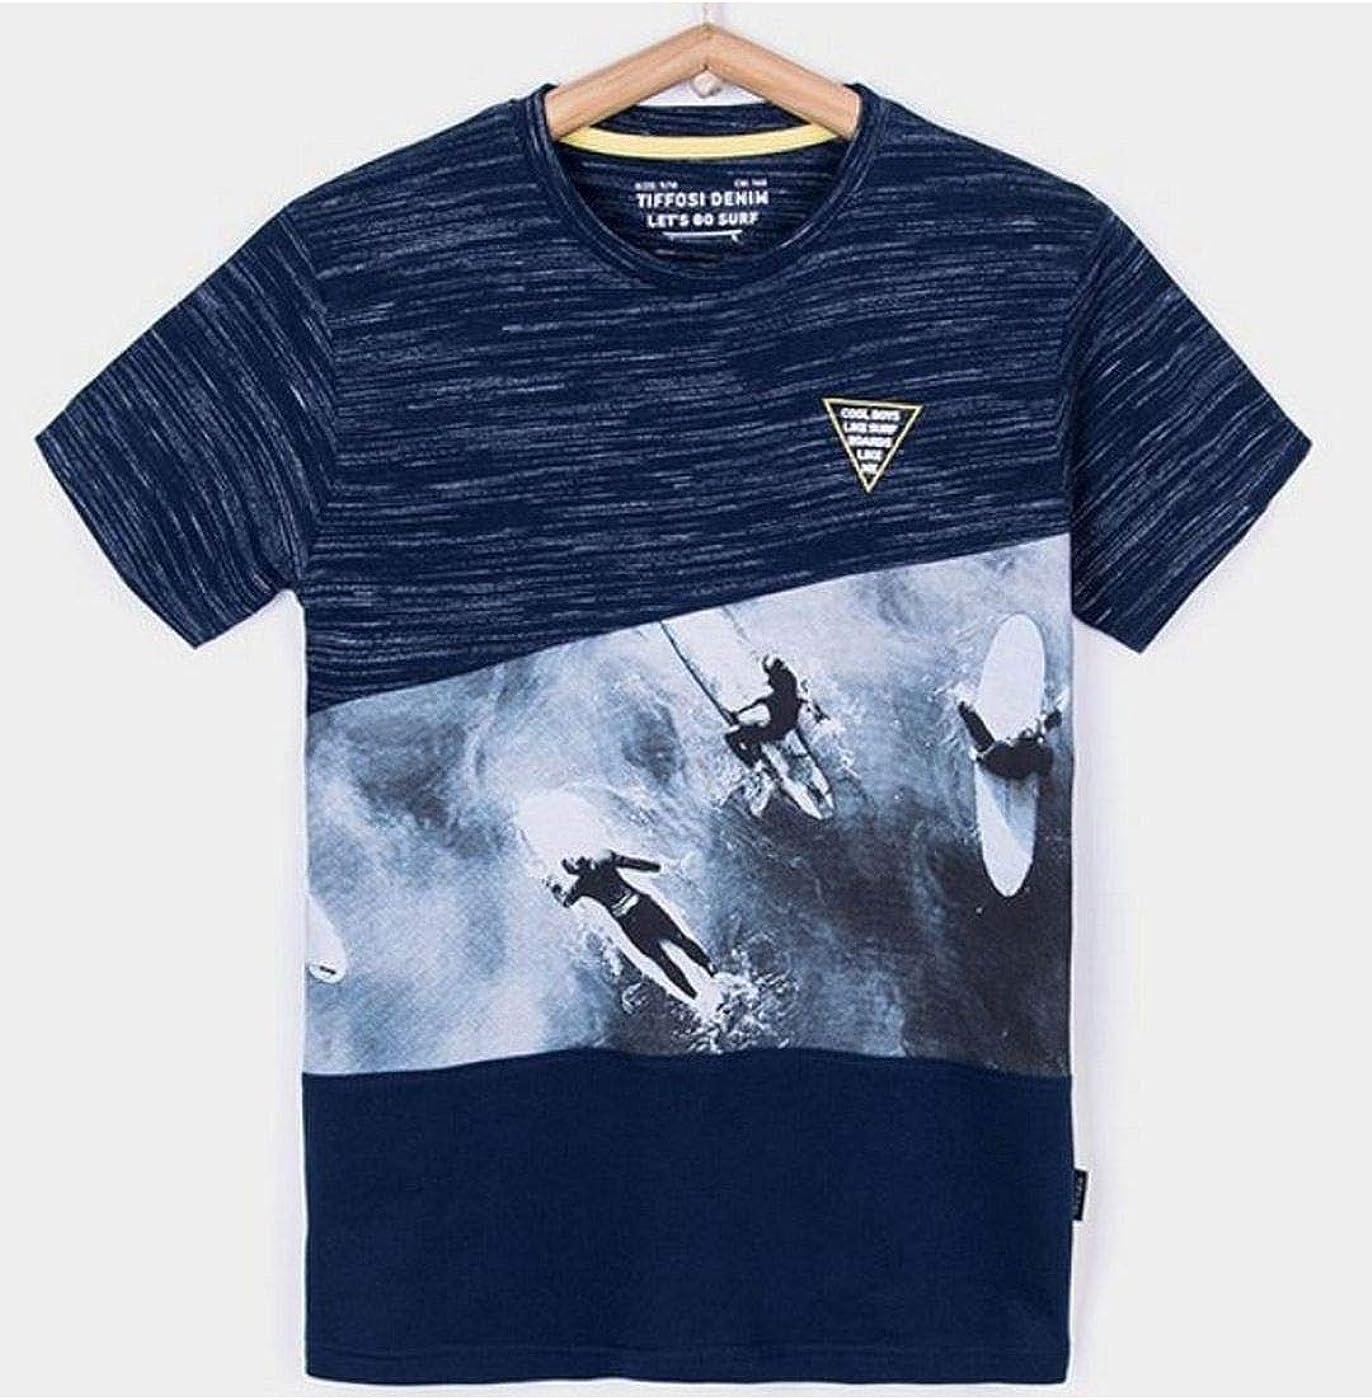 Tiffosi Camiseta Niño Marino SURFISTAS Titan: Amazon.es: Ropa y accesorios